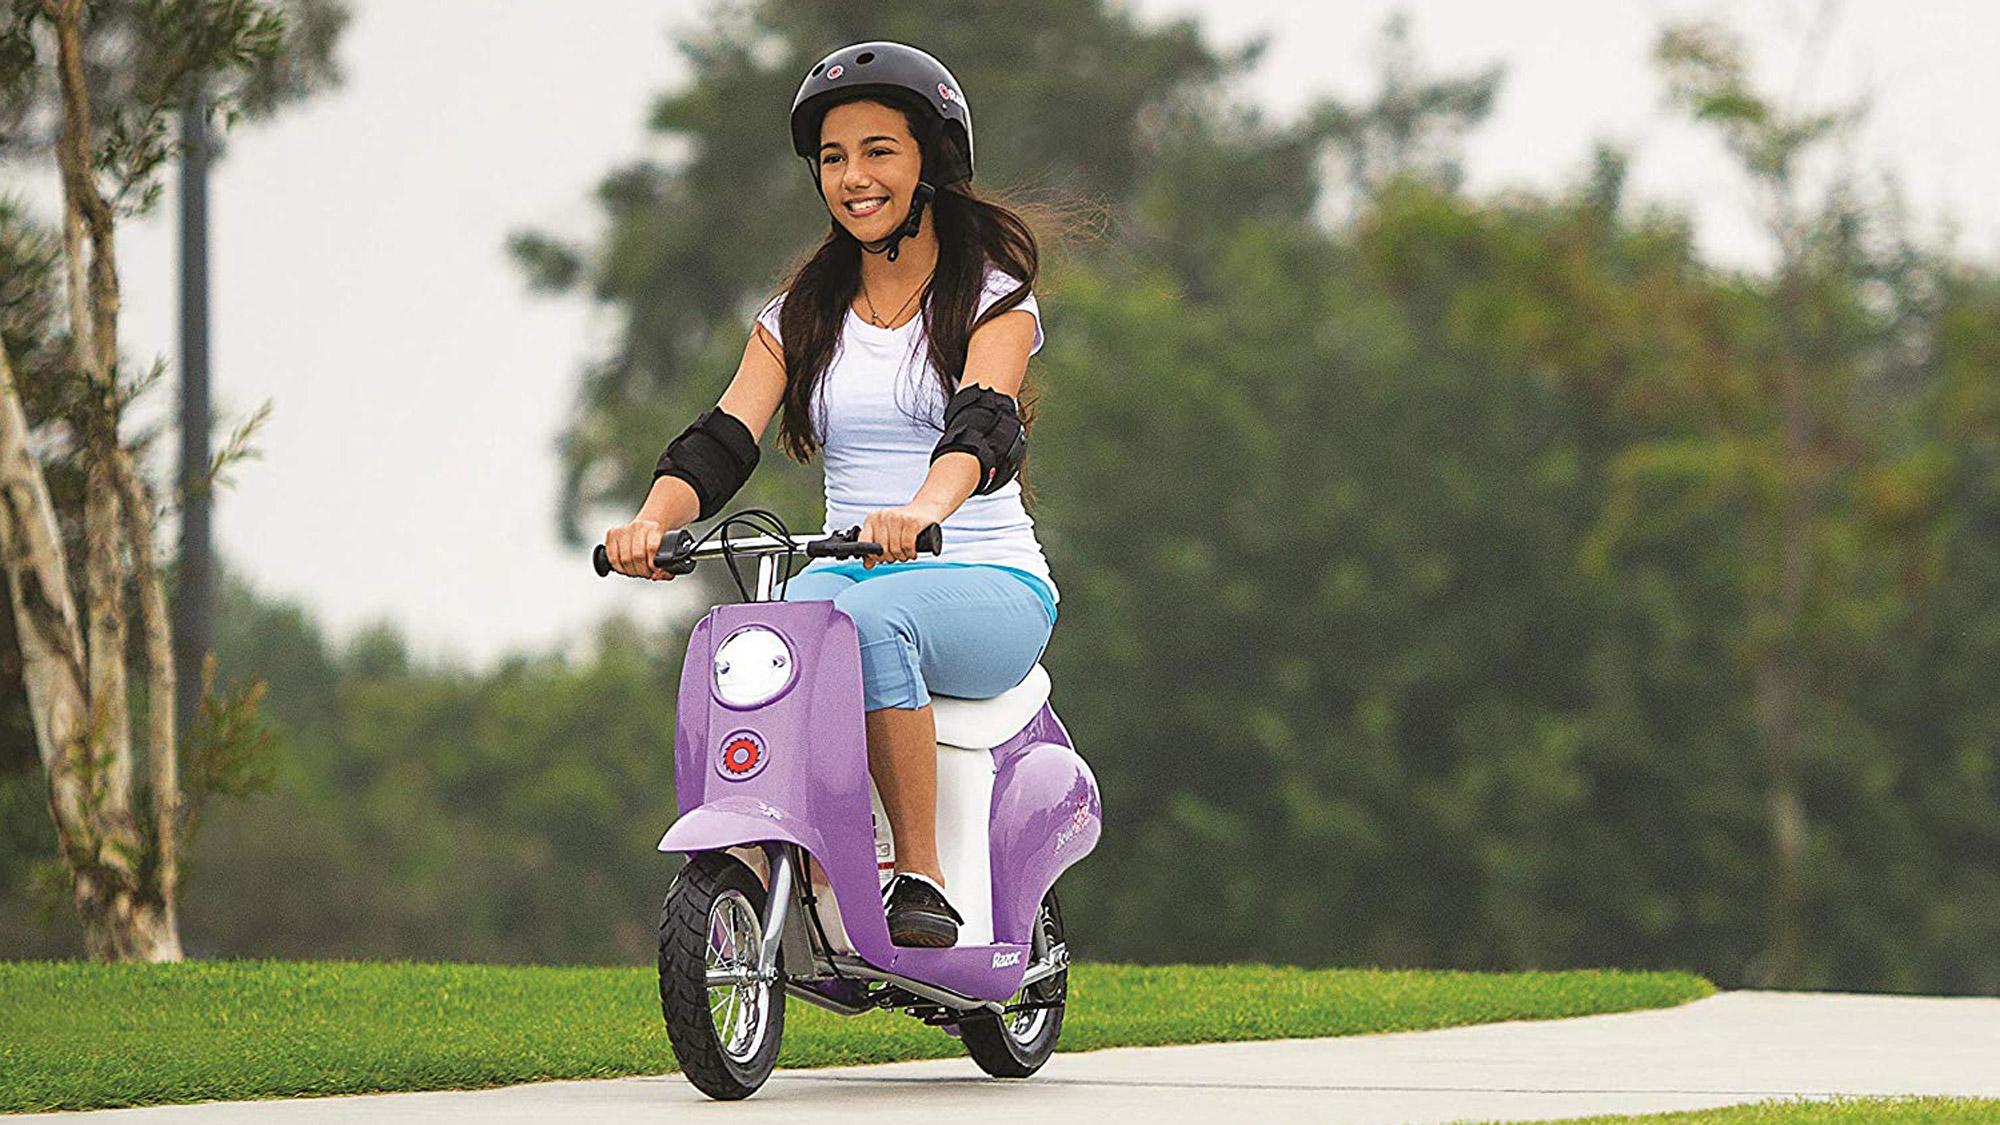 Melhores scooters elétricas: Navalha Pocket Mod Miniature Euro